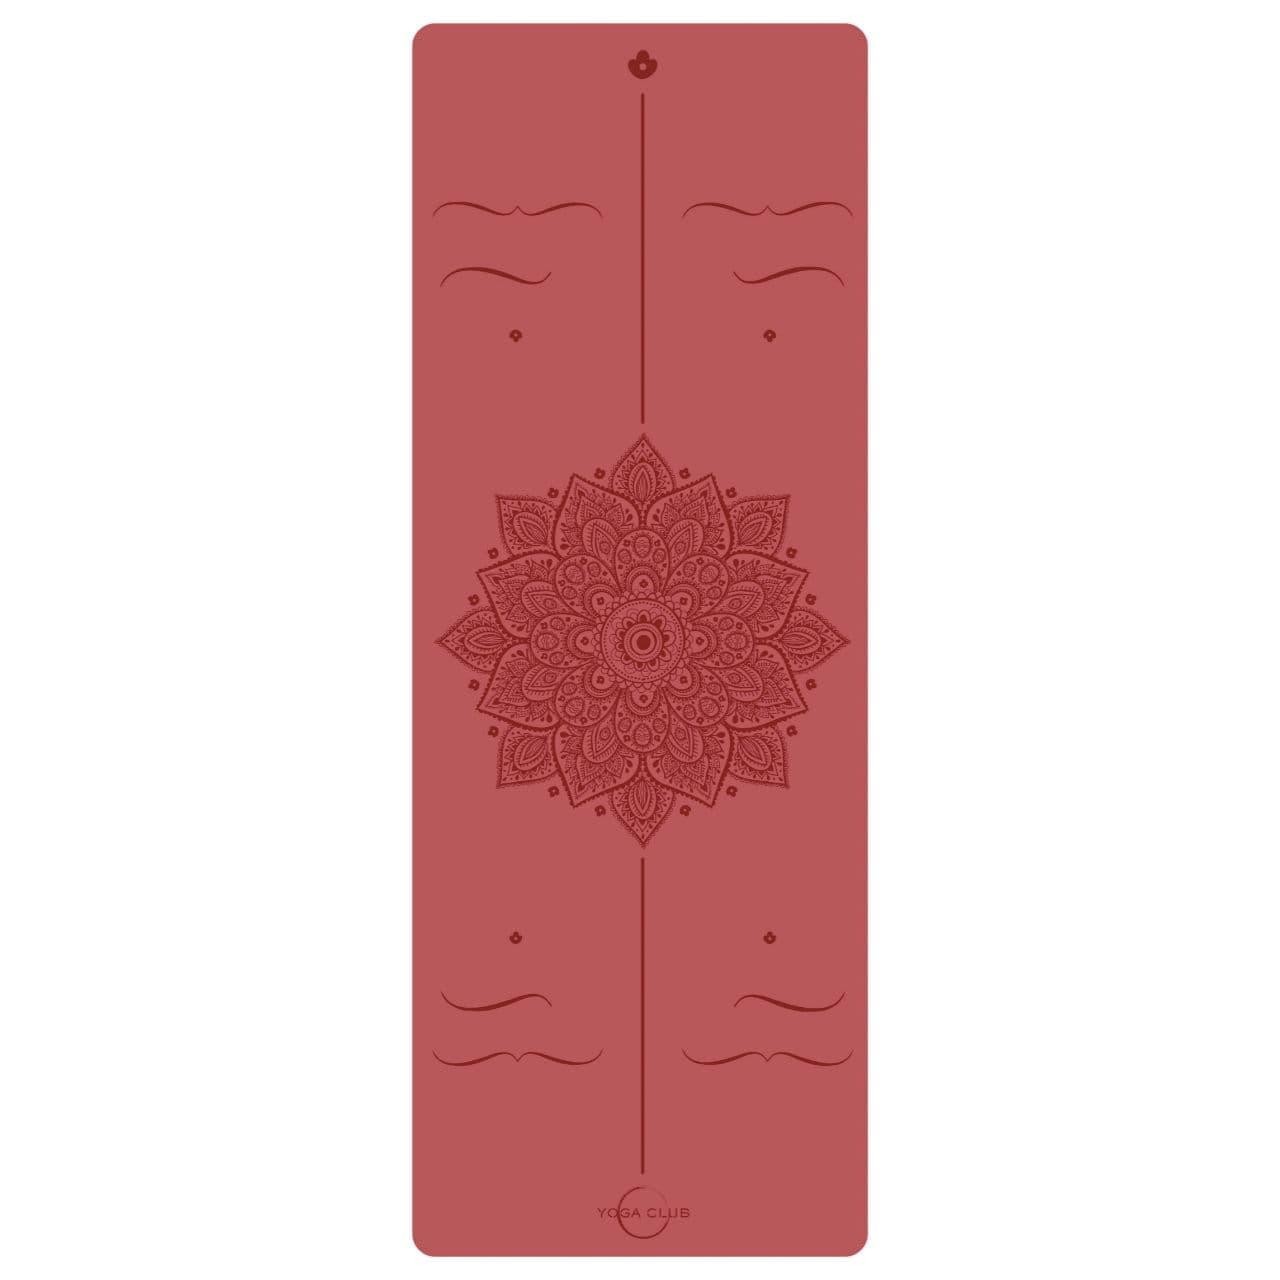 Коврик для йоги AMRA RED 4,5 мм 68х185 см Yoga Club из каучука с покрытием NON SLIP